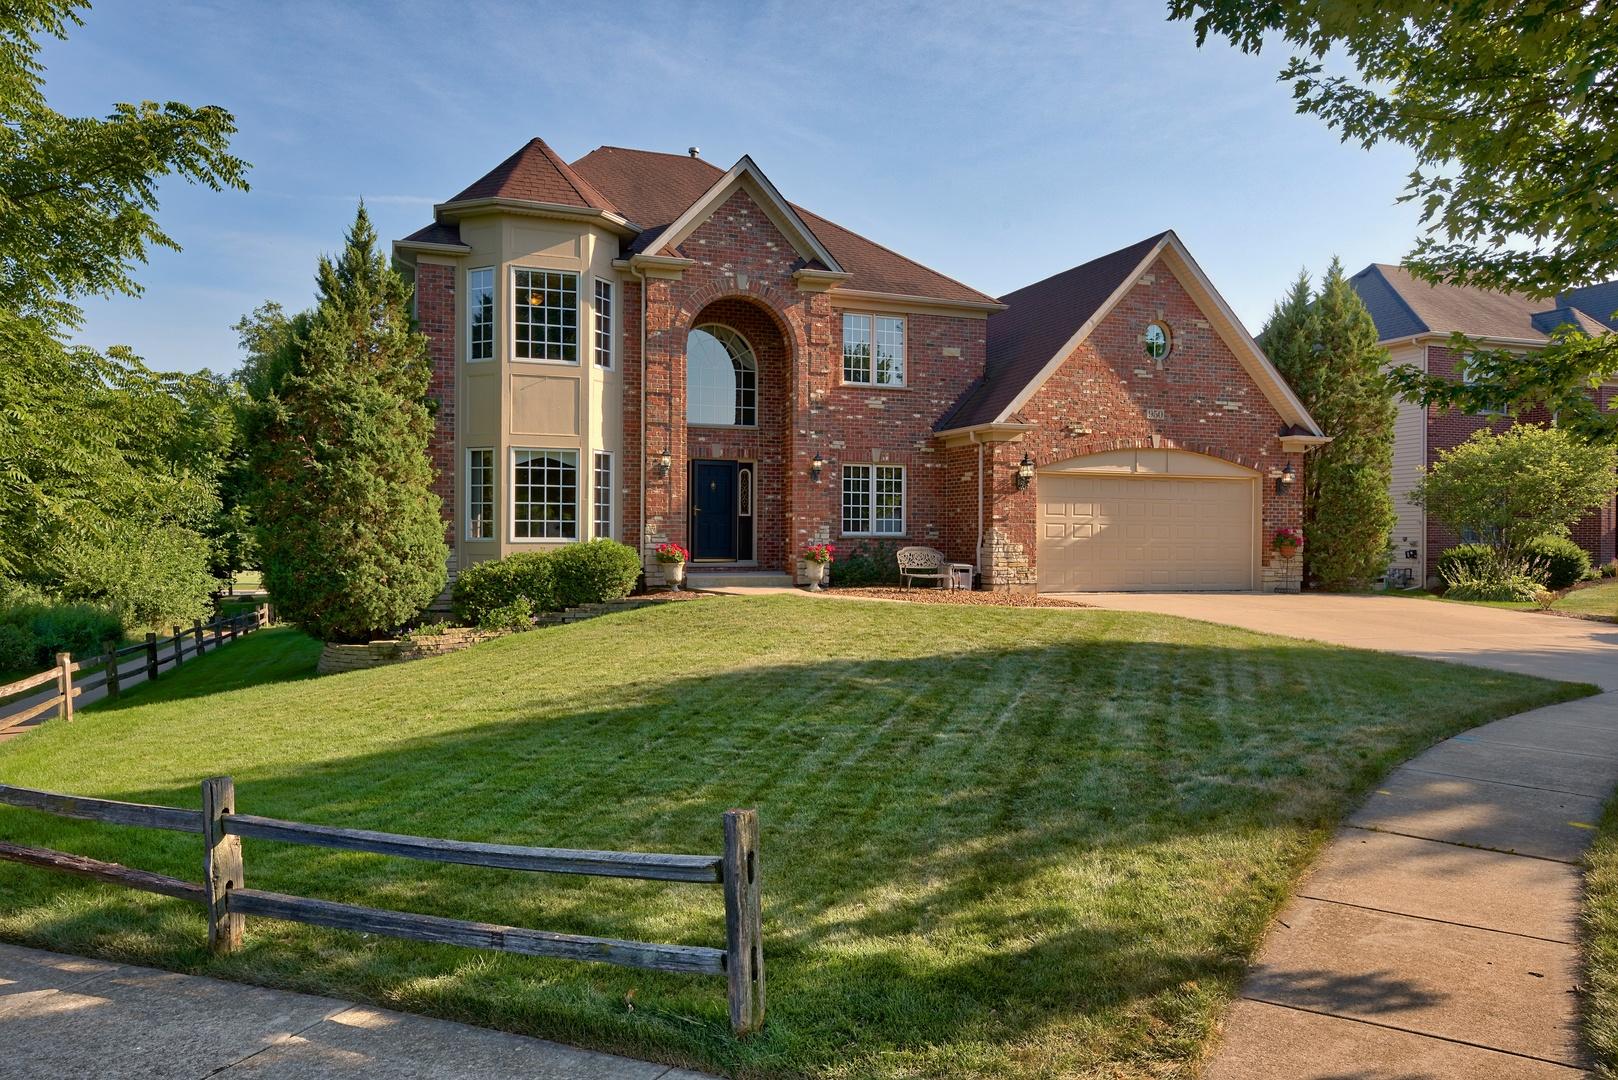 950 Tierney Lane, Batavia, Illinois